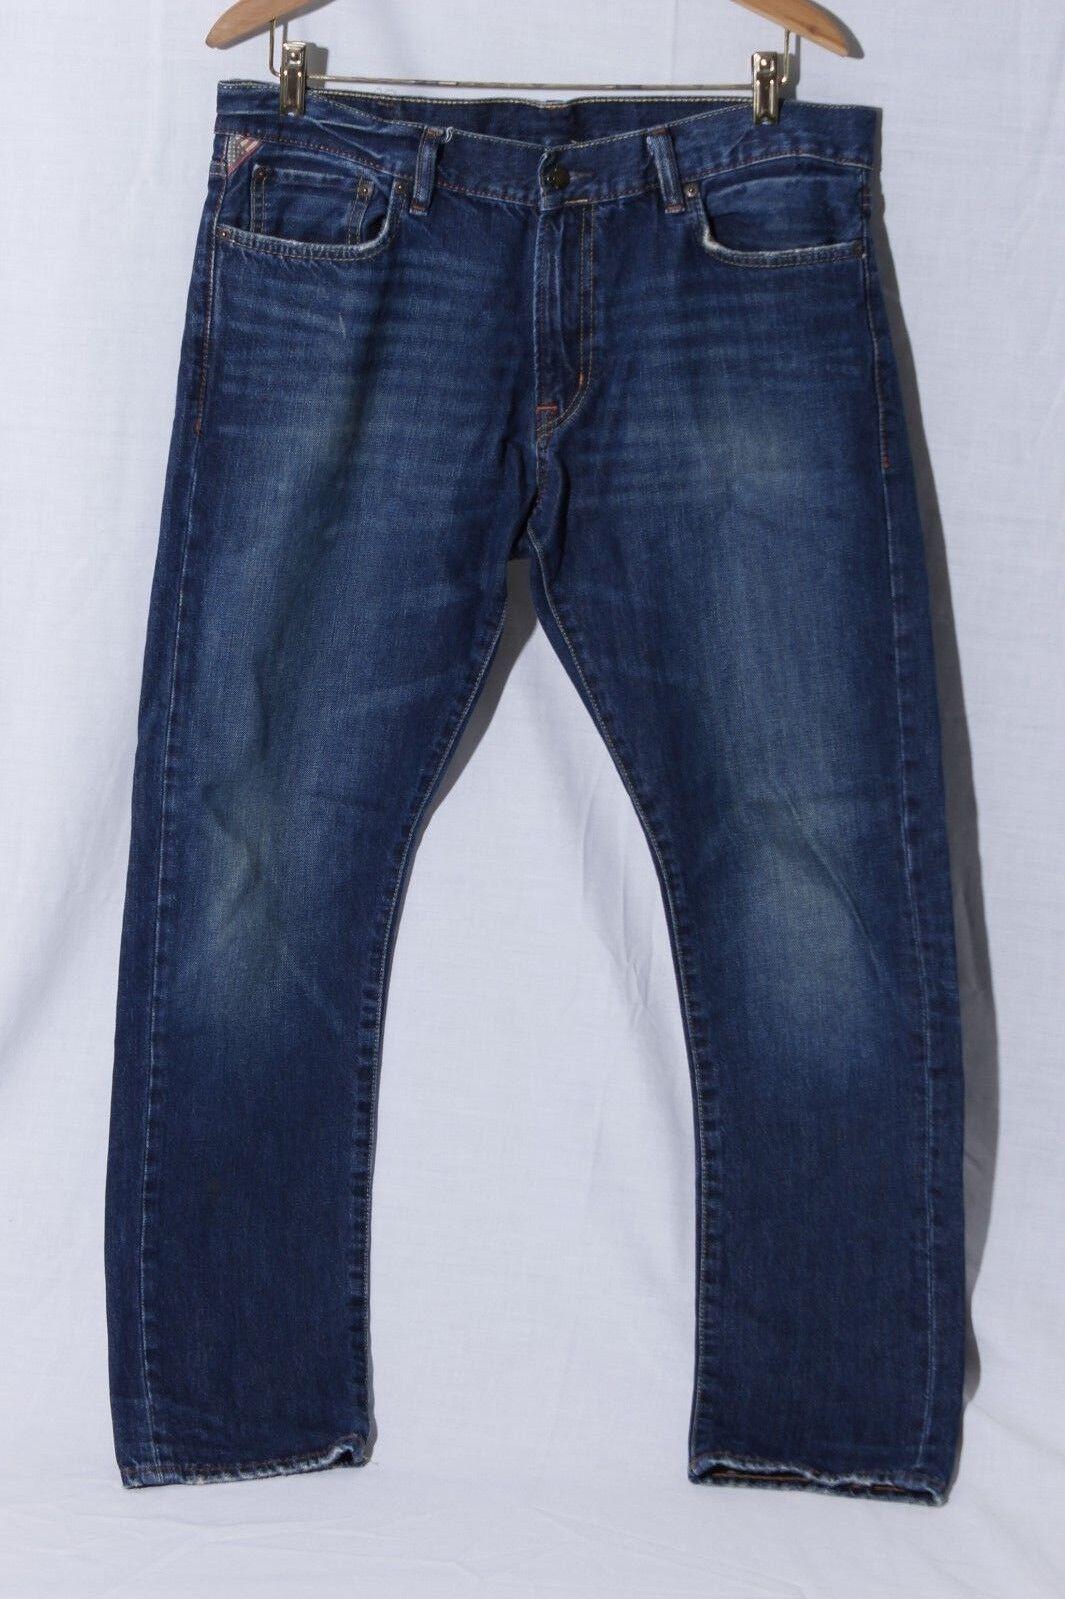 Ralph Lauren Denim & Supply Men's Tapered Straight bluee Jeans sz 34 30